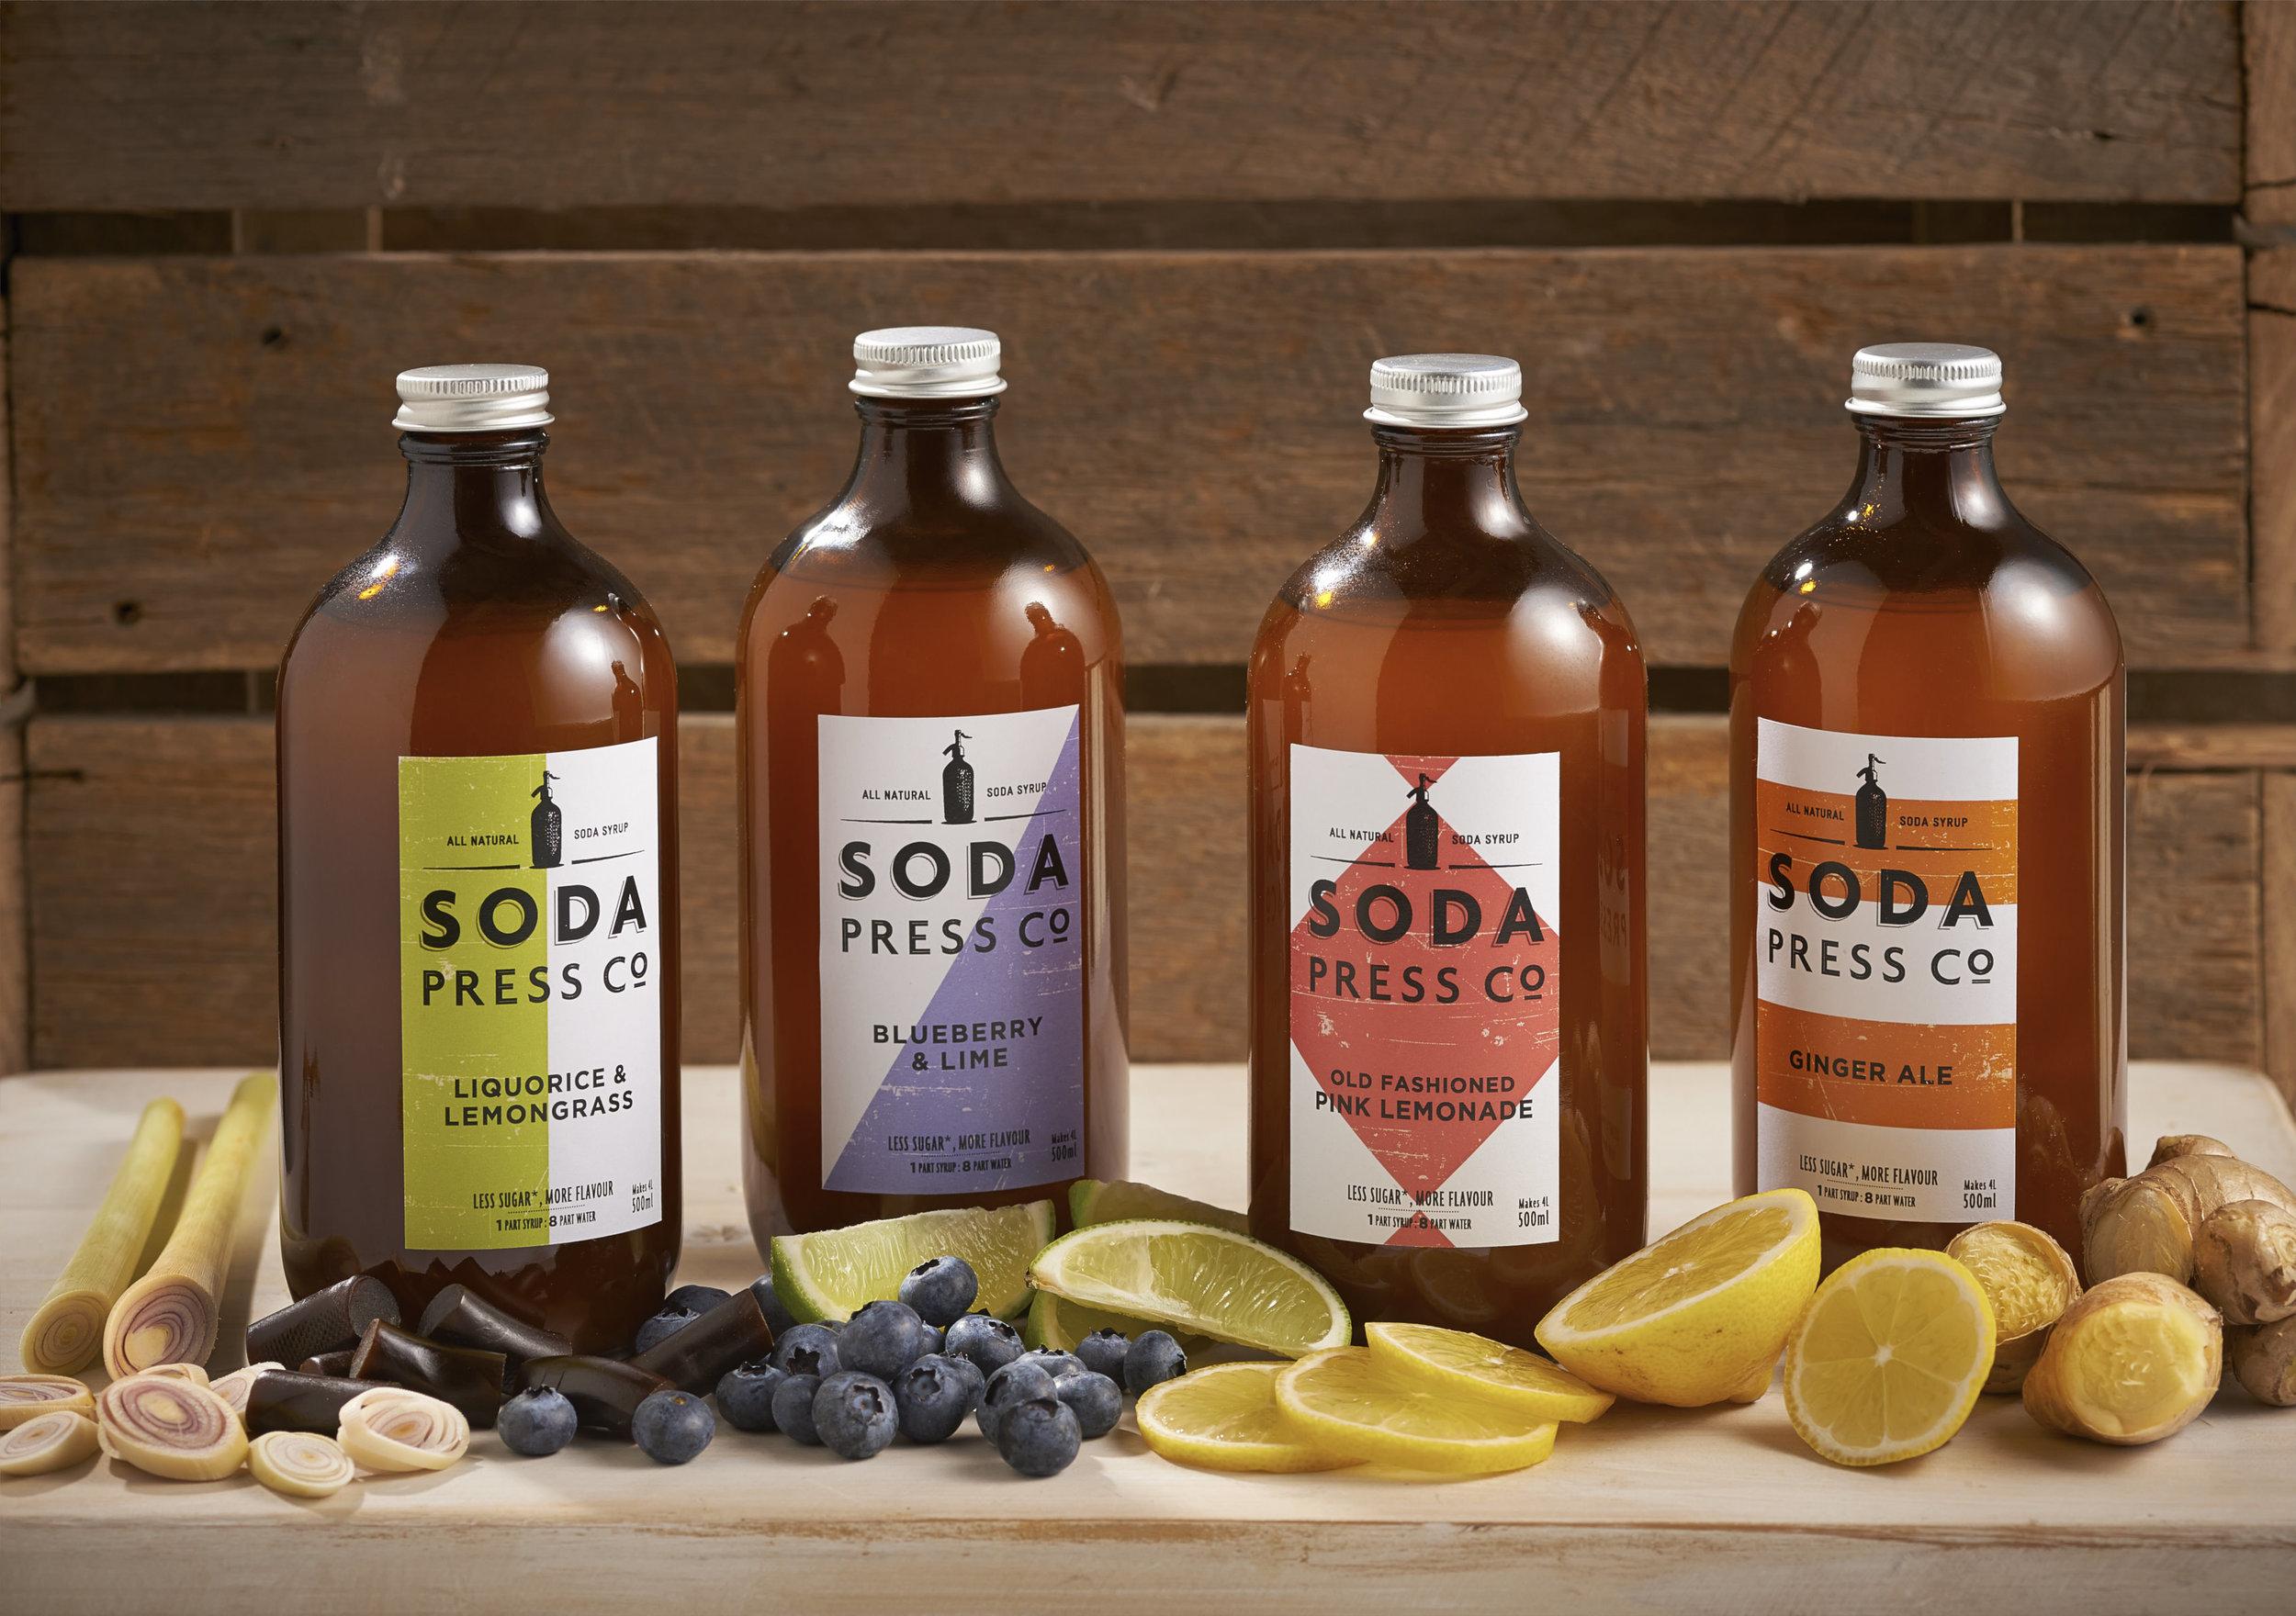 Soda Press Co. organic syrup